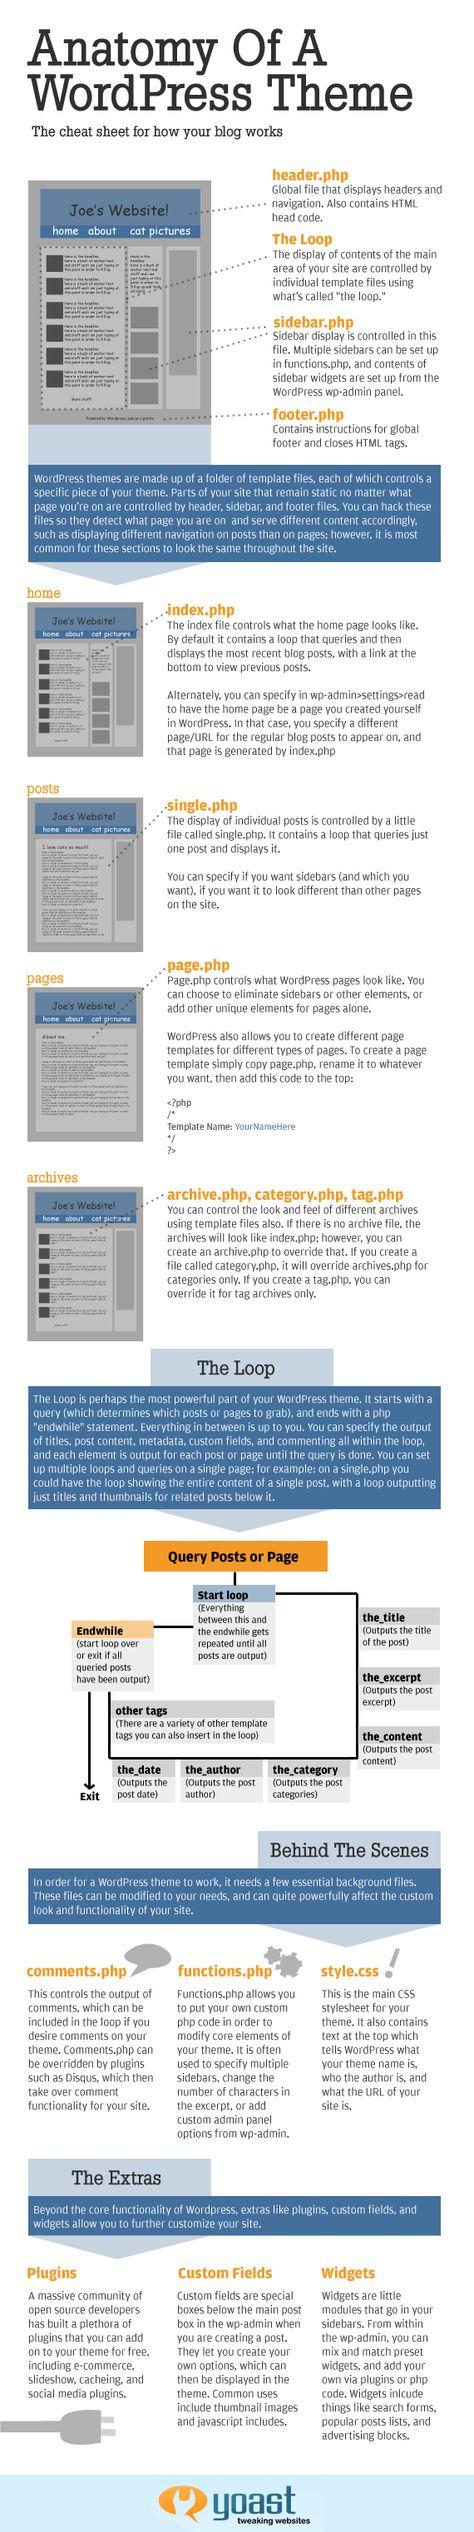 5 Must see WordPress Infographics